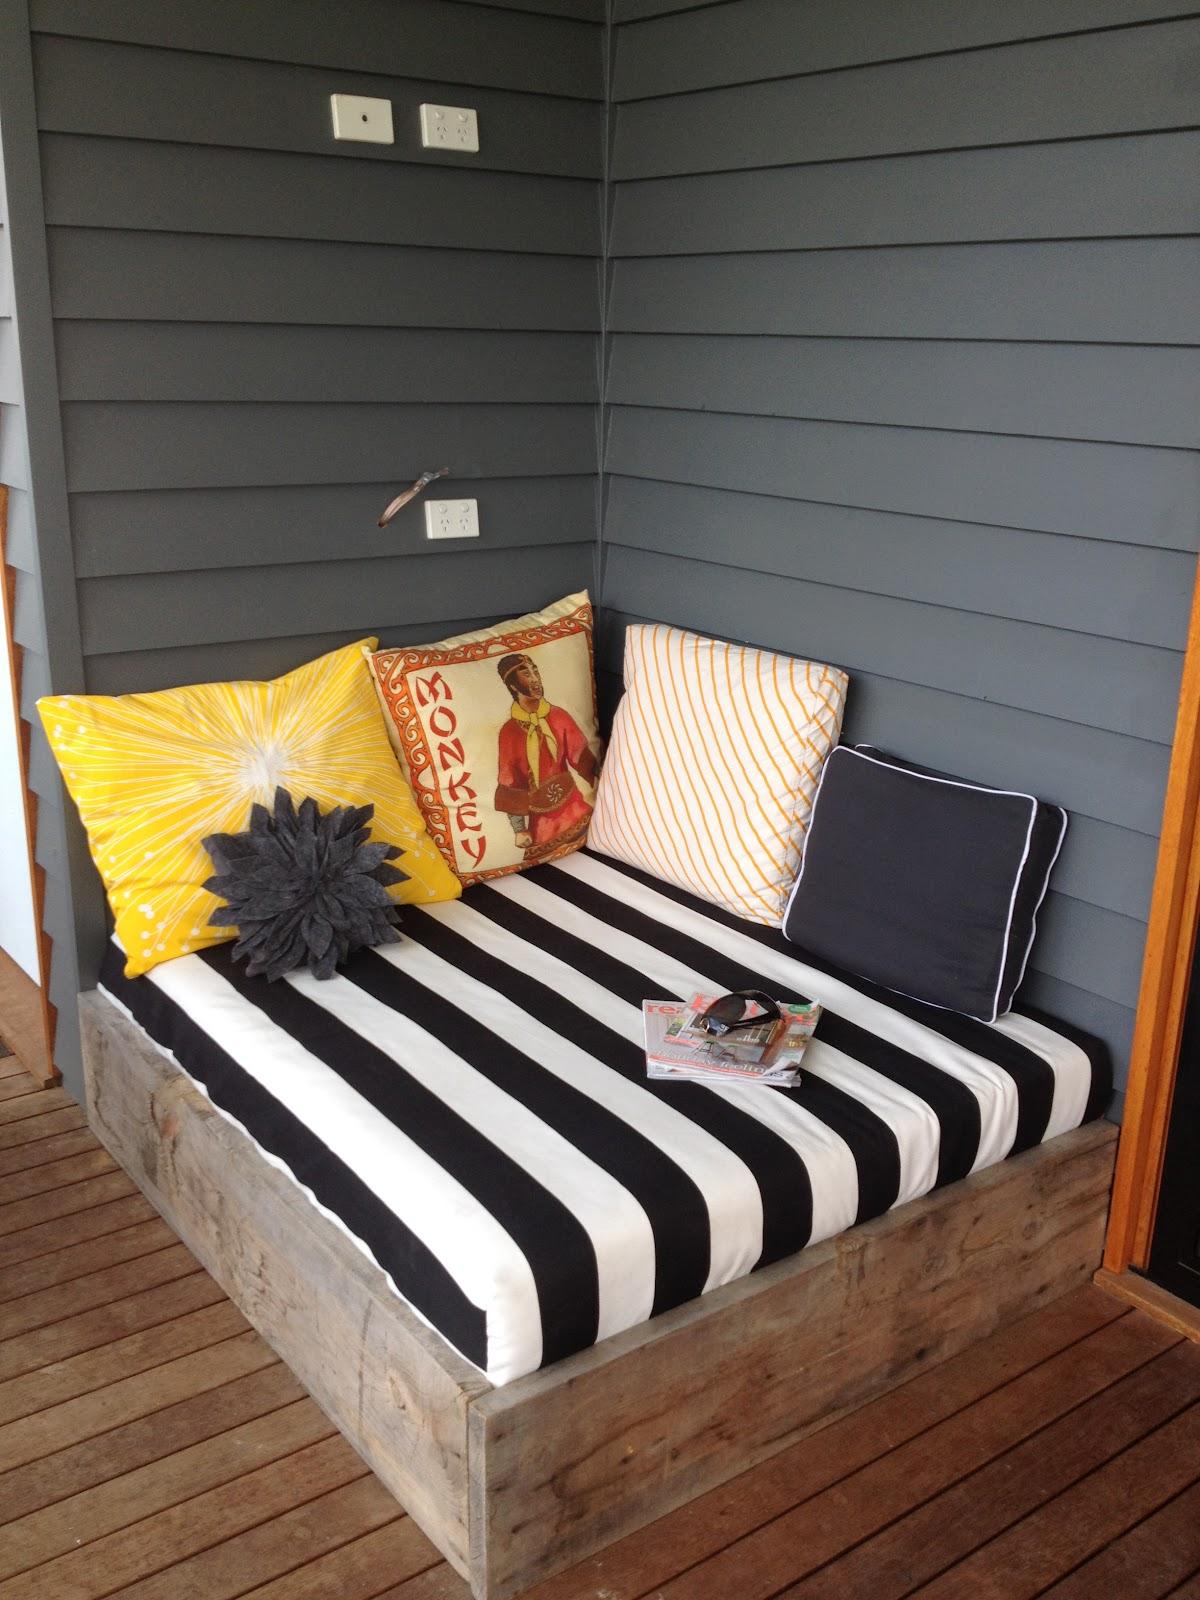 20 DIY Outdoor Projects - The Idea Room on Diy Garden Patio Ideas id=80138